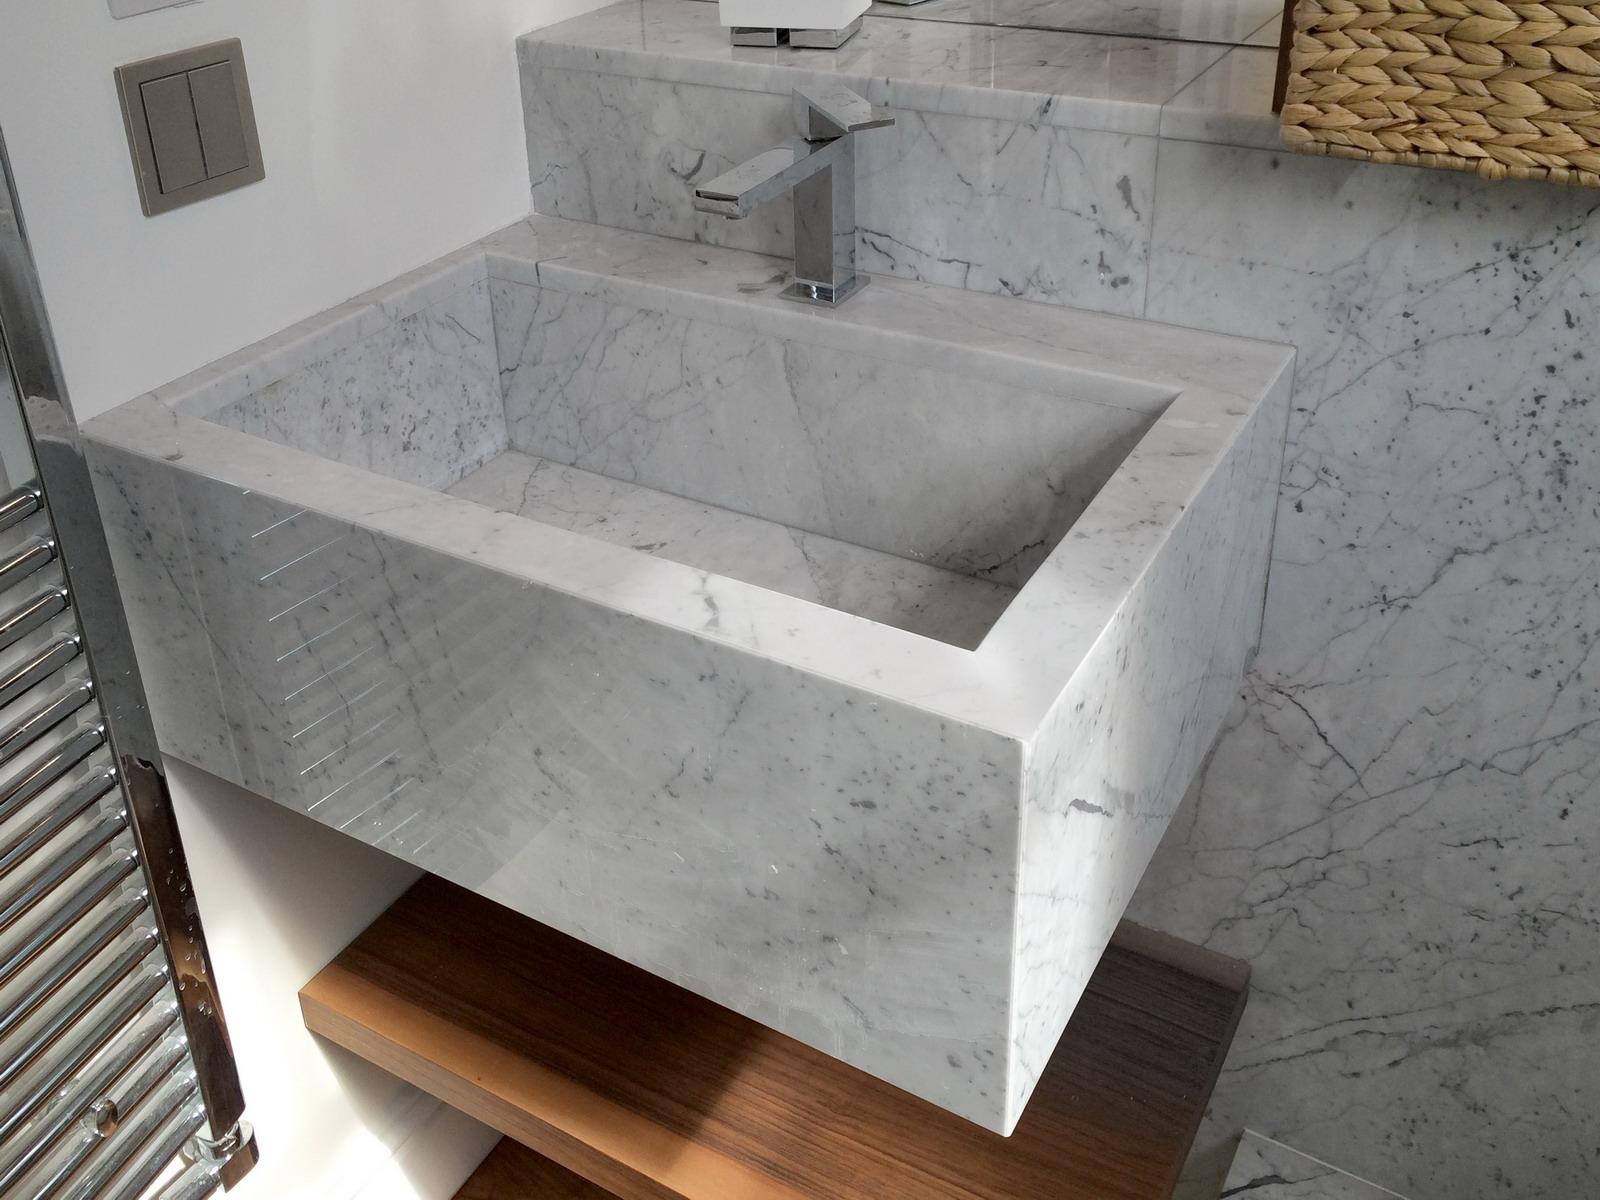 Appartamento Londra UK - Lavabo in Marmo Bianco